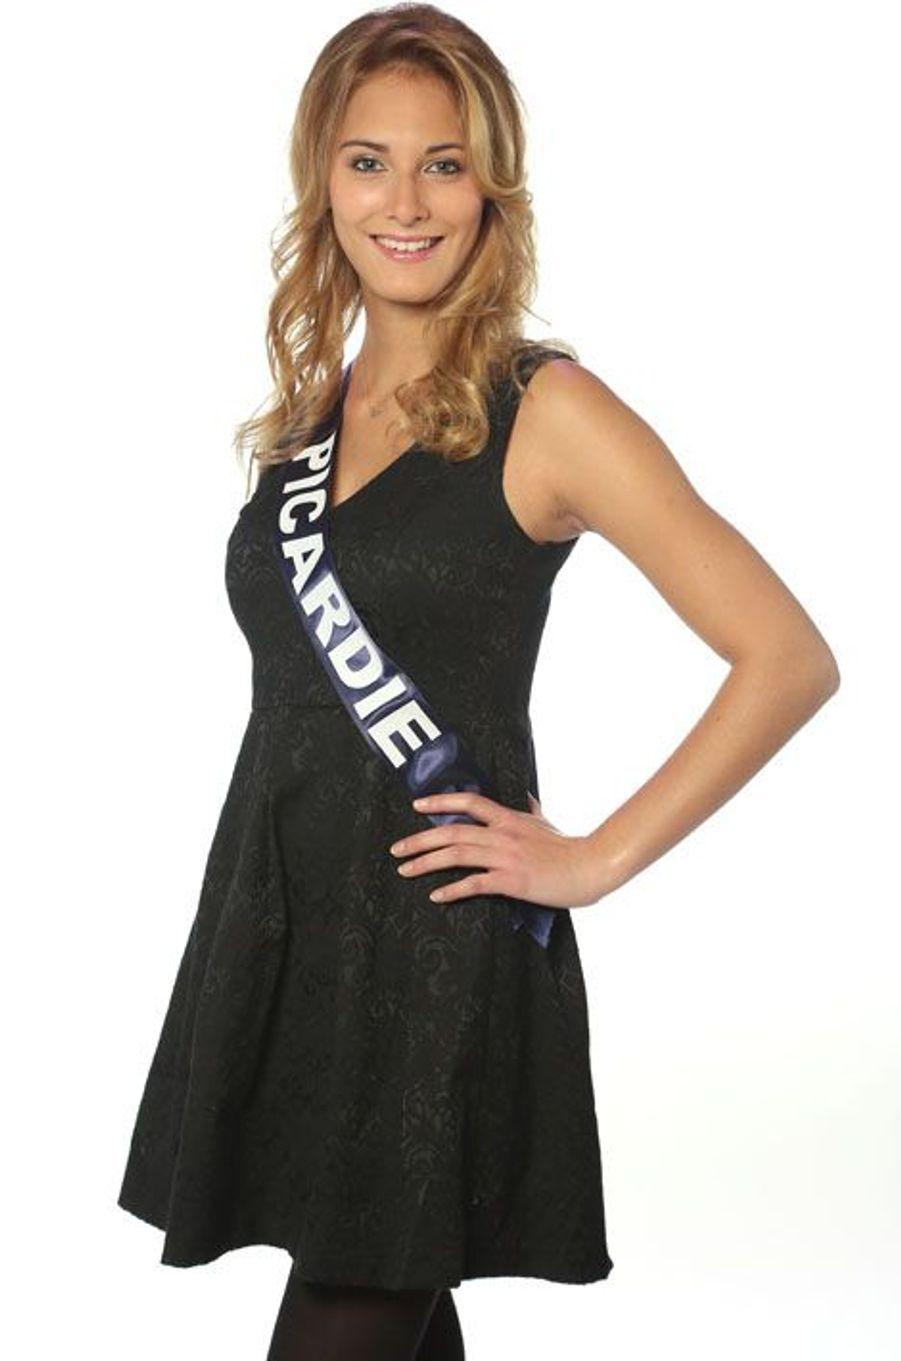 Manon Beurey ,19 ans, Miss Picardie